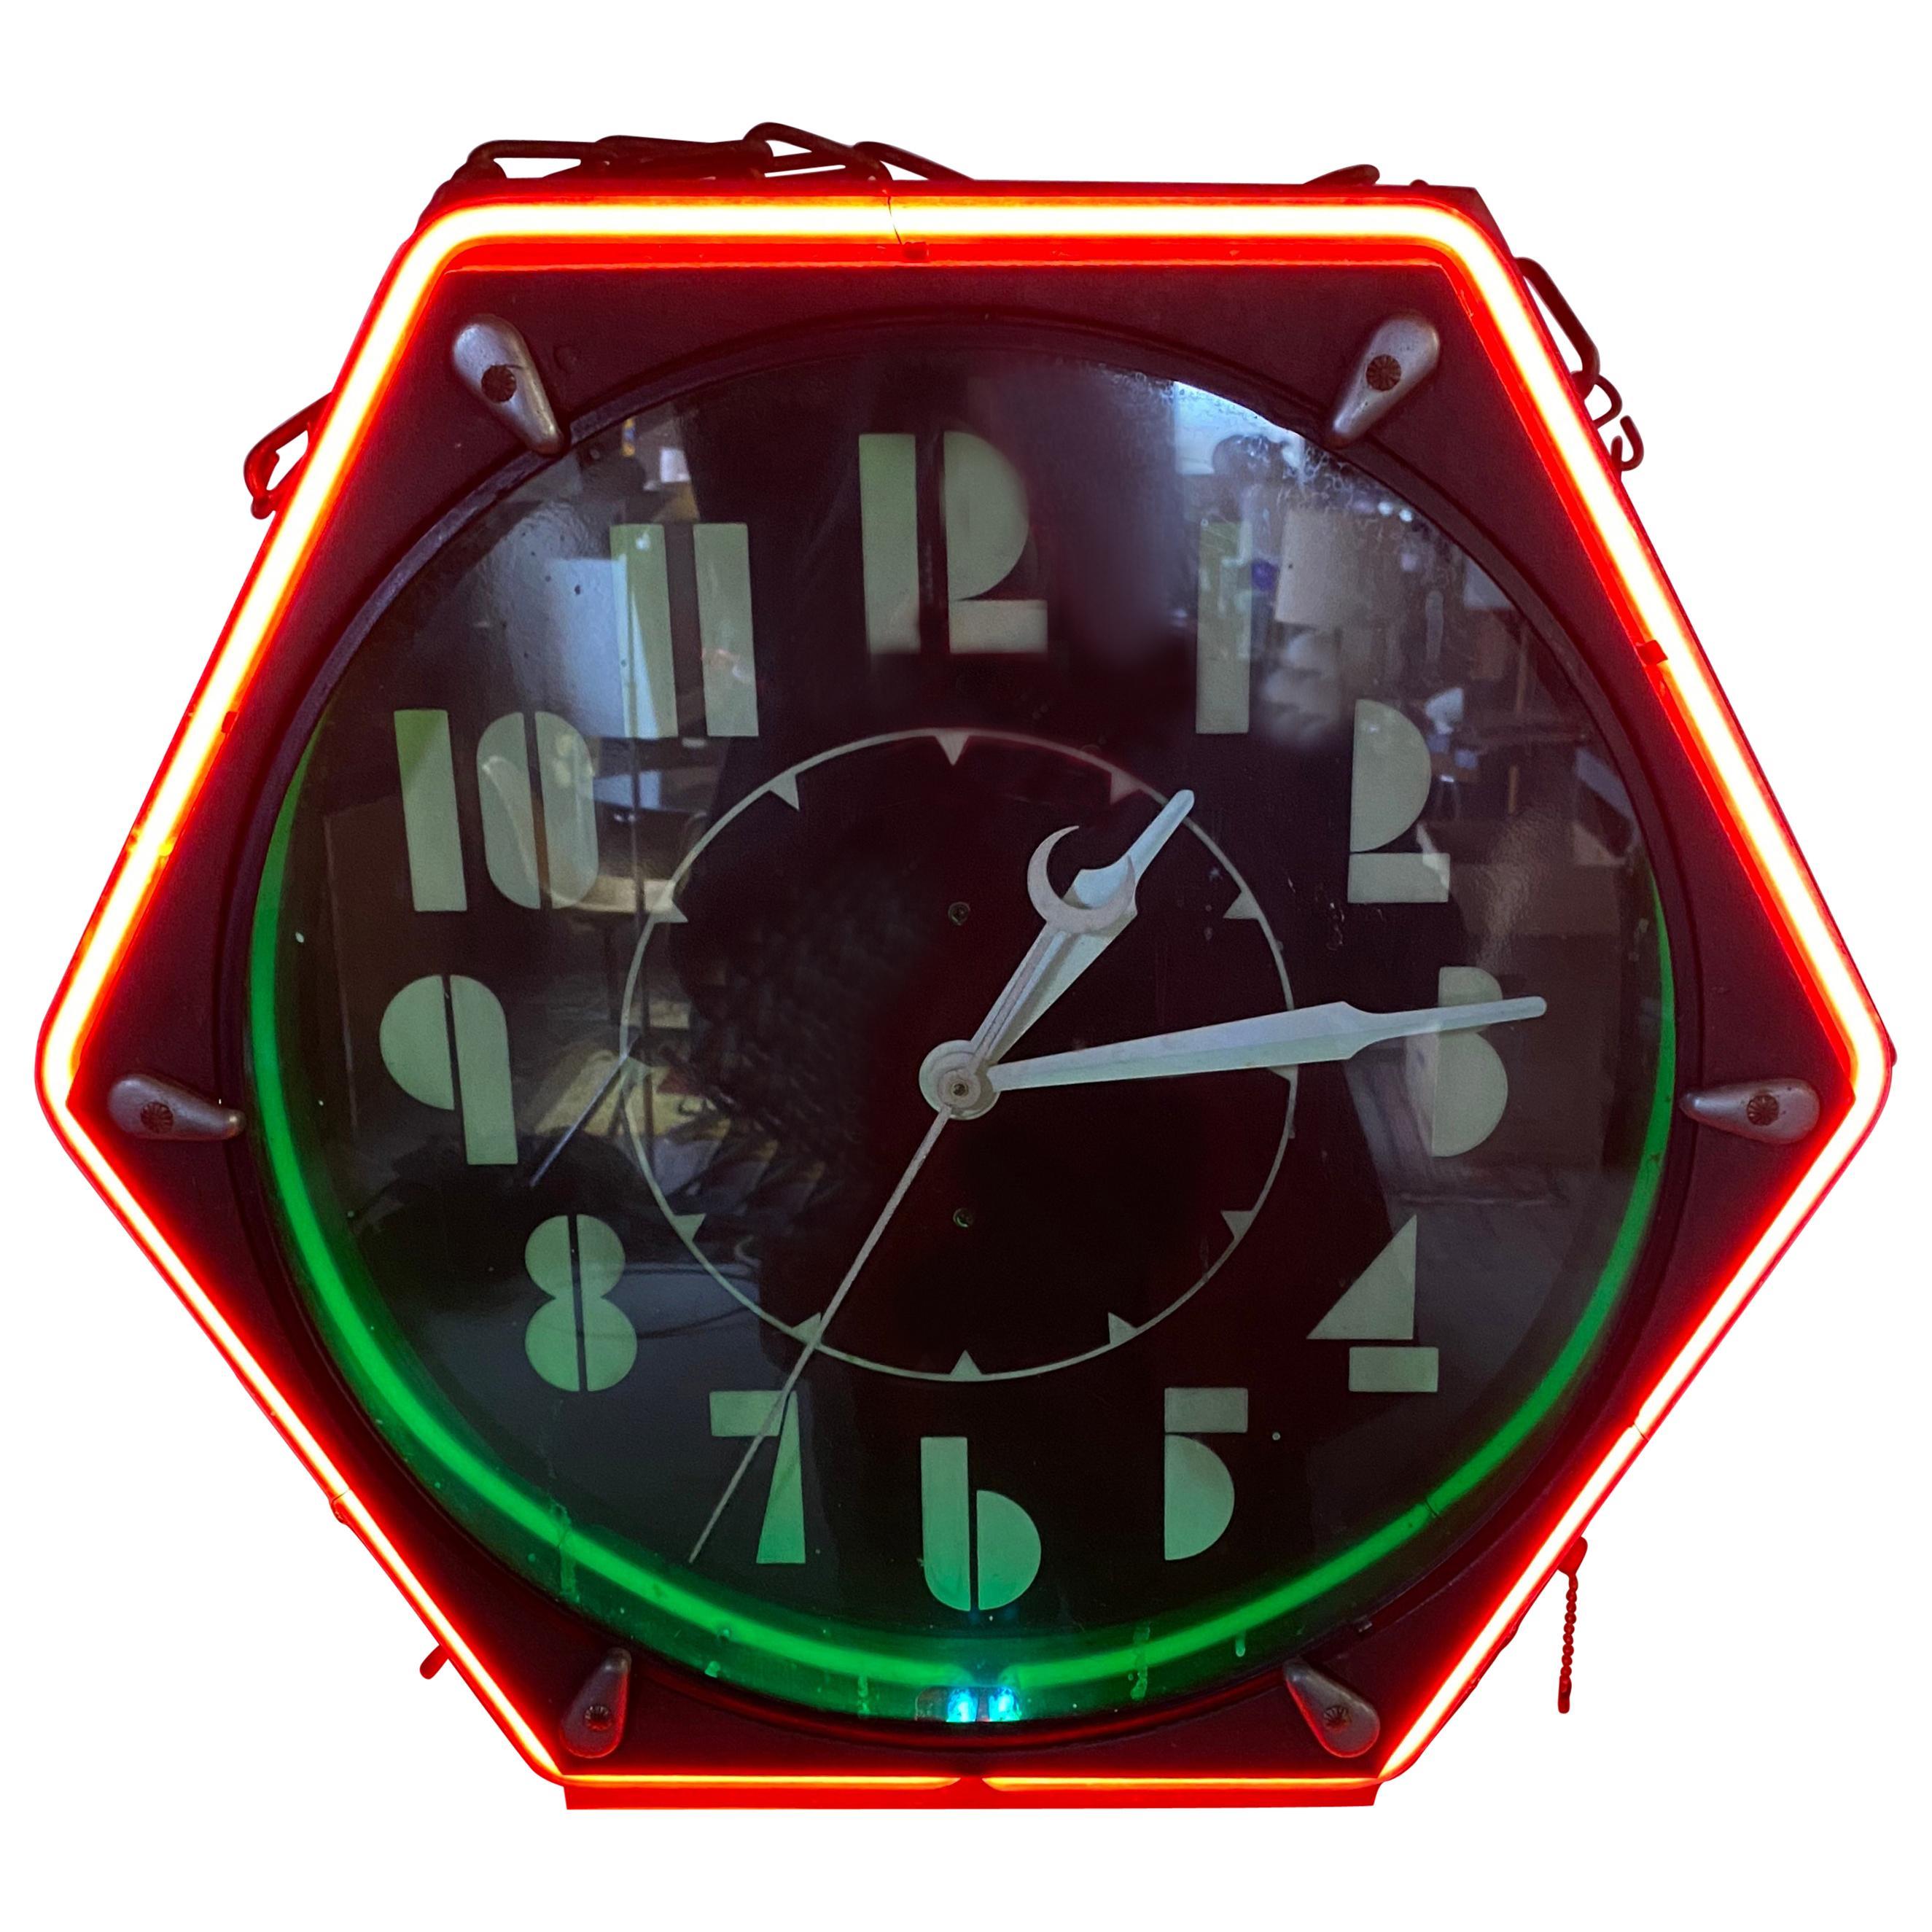 Seldom Seen Art Deco Neon Hexagon Clock, 'The Electric Clock Co. Cleveland